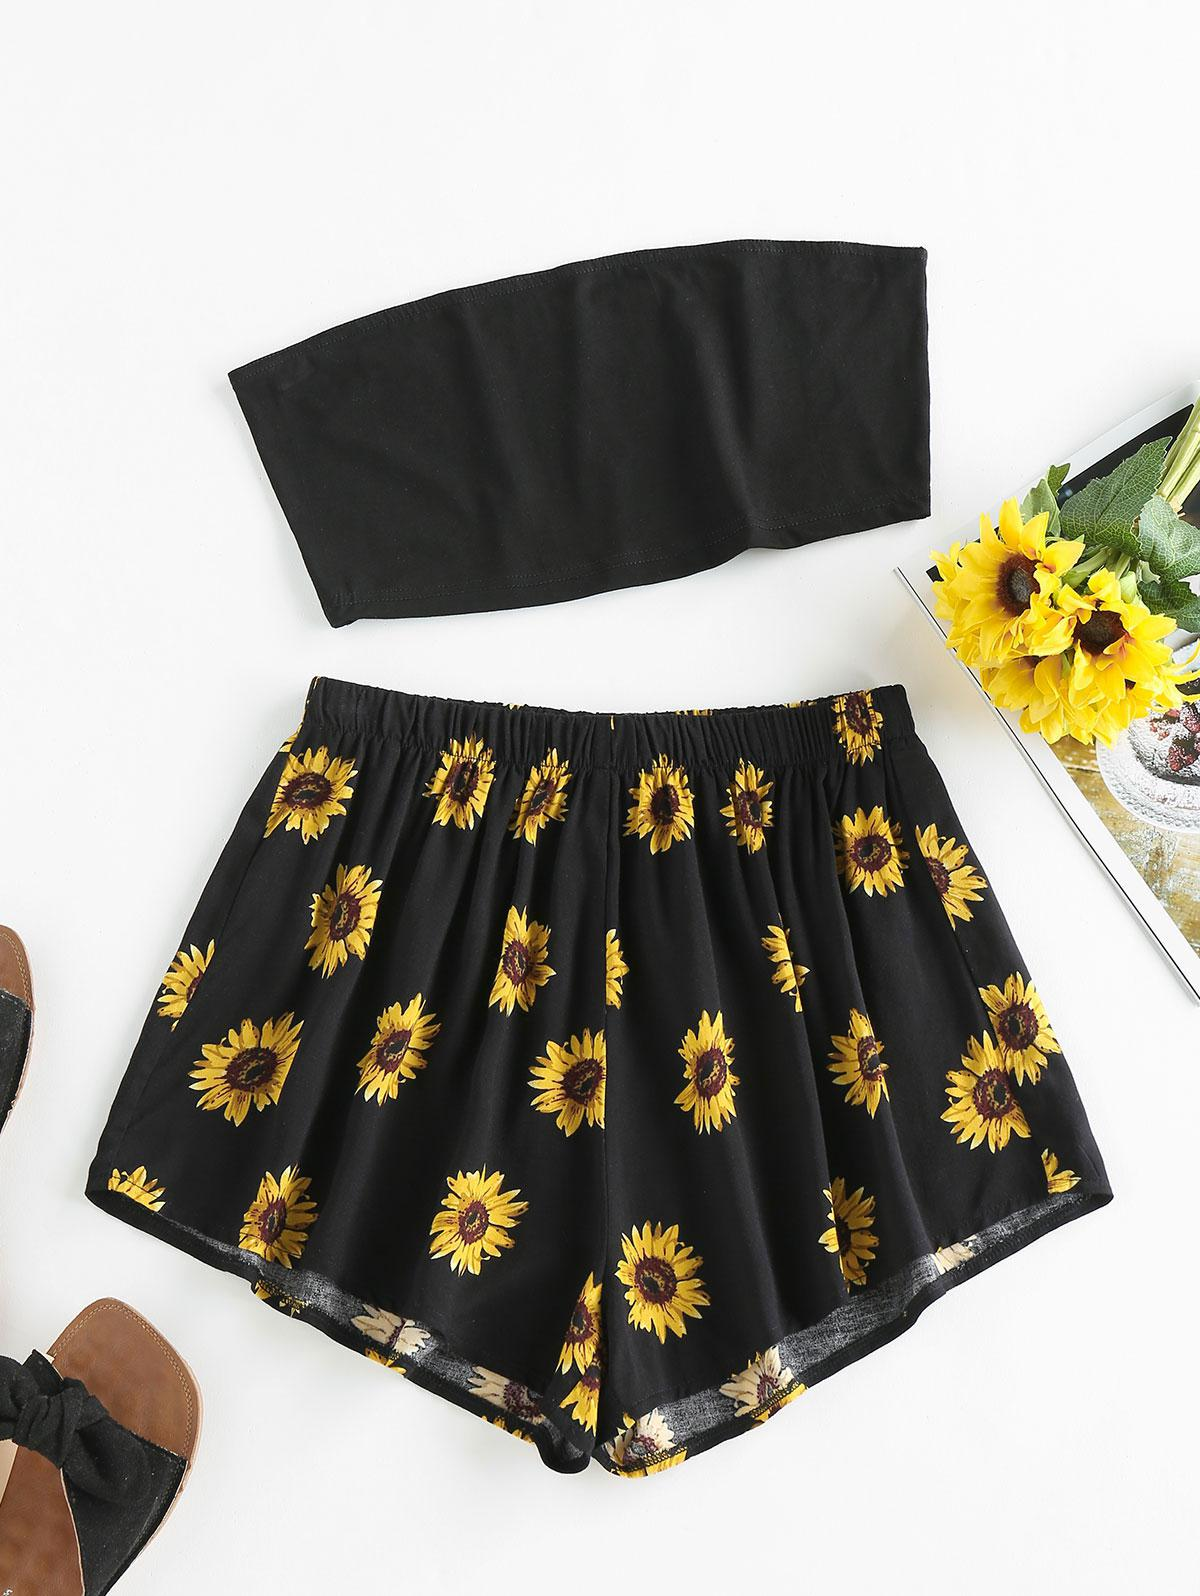 ZAFUL Sunflower Print Strapless Wide Leg Shorts Set